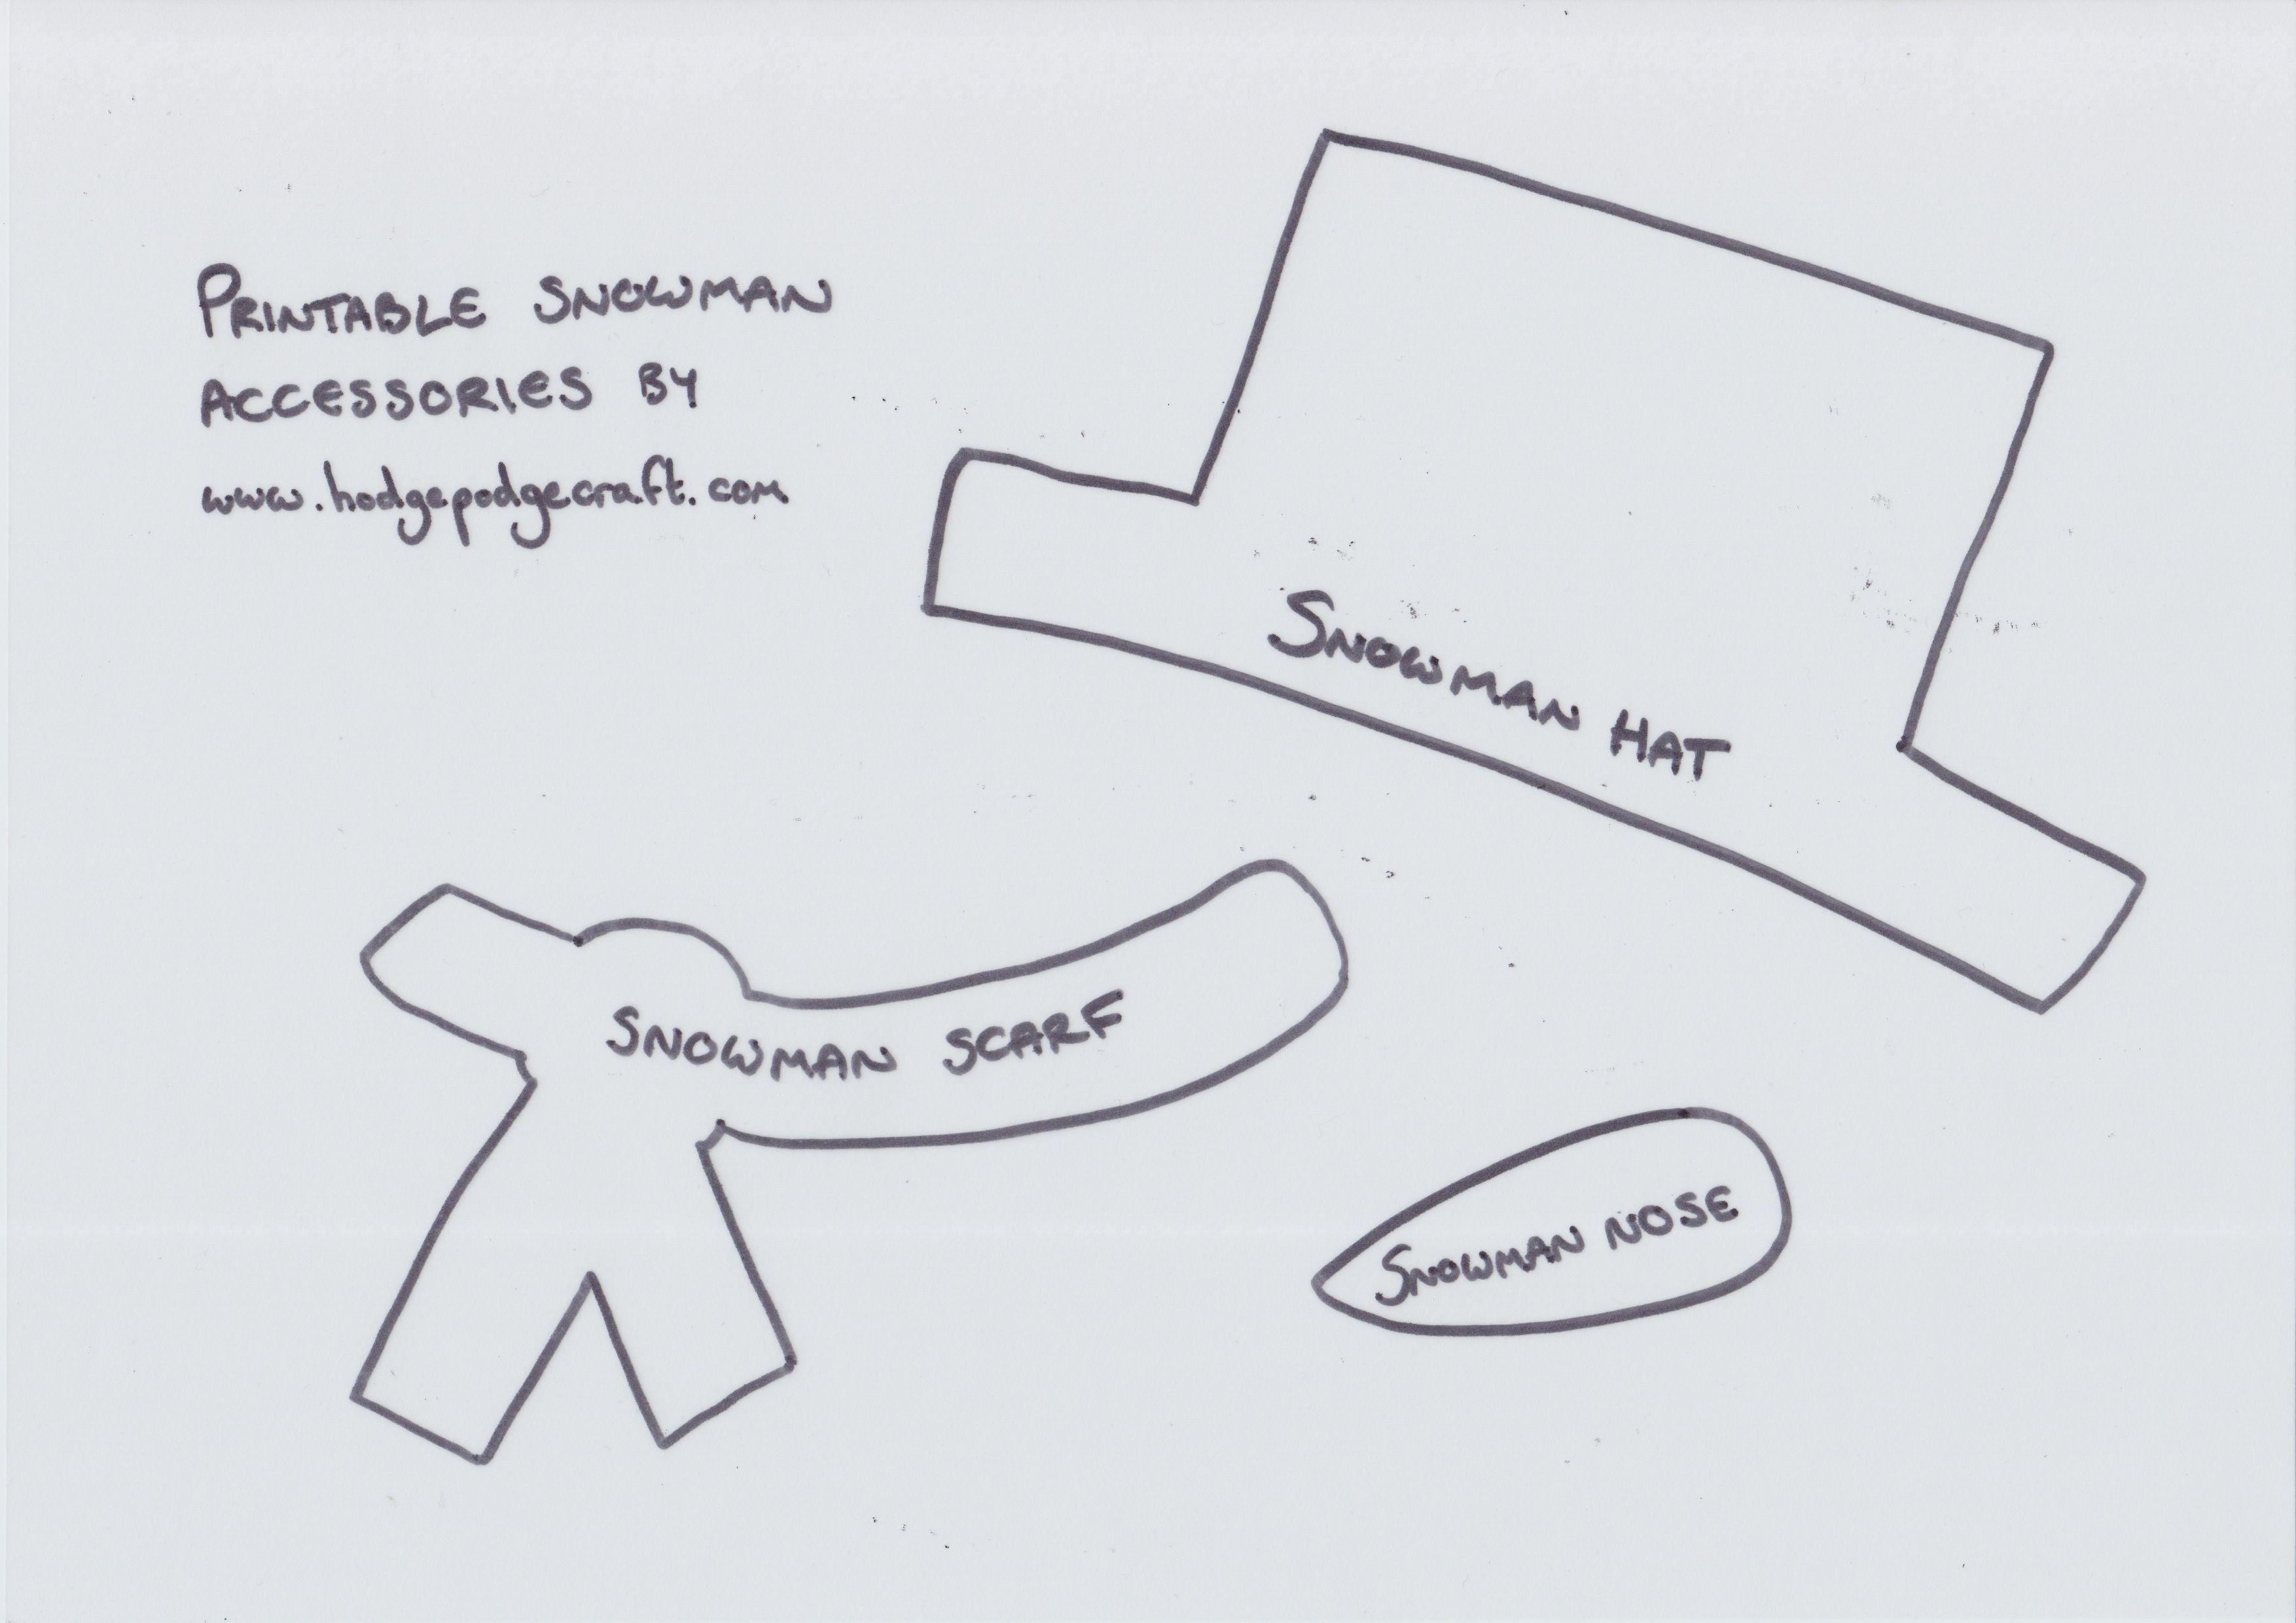 Pinkaren Lashley On The Holiday Inn | Snowman Crafts, Snowman - Free Printable Snowman Patterns